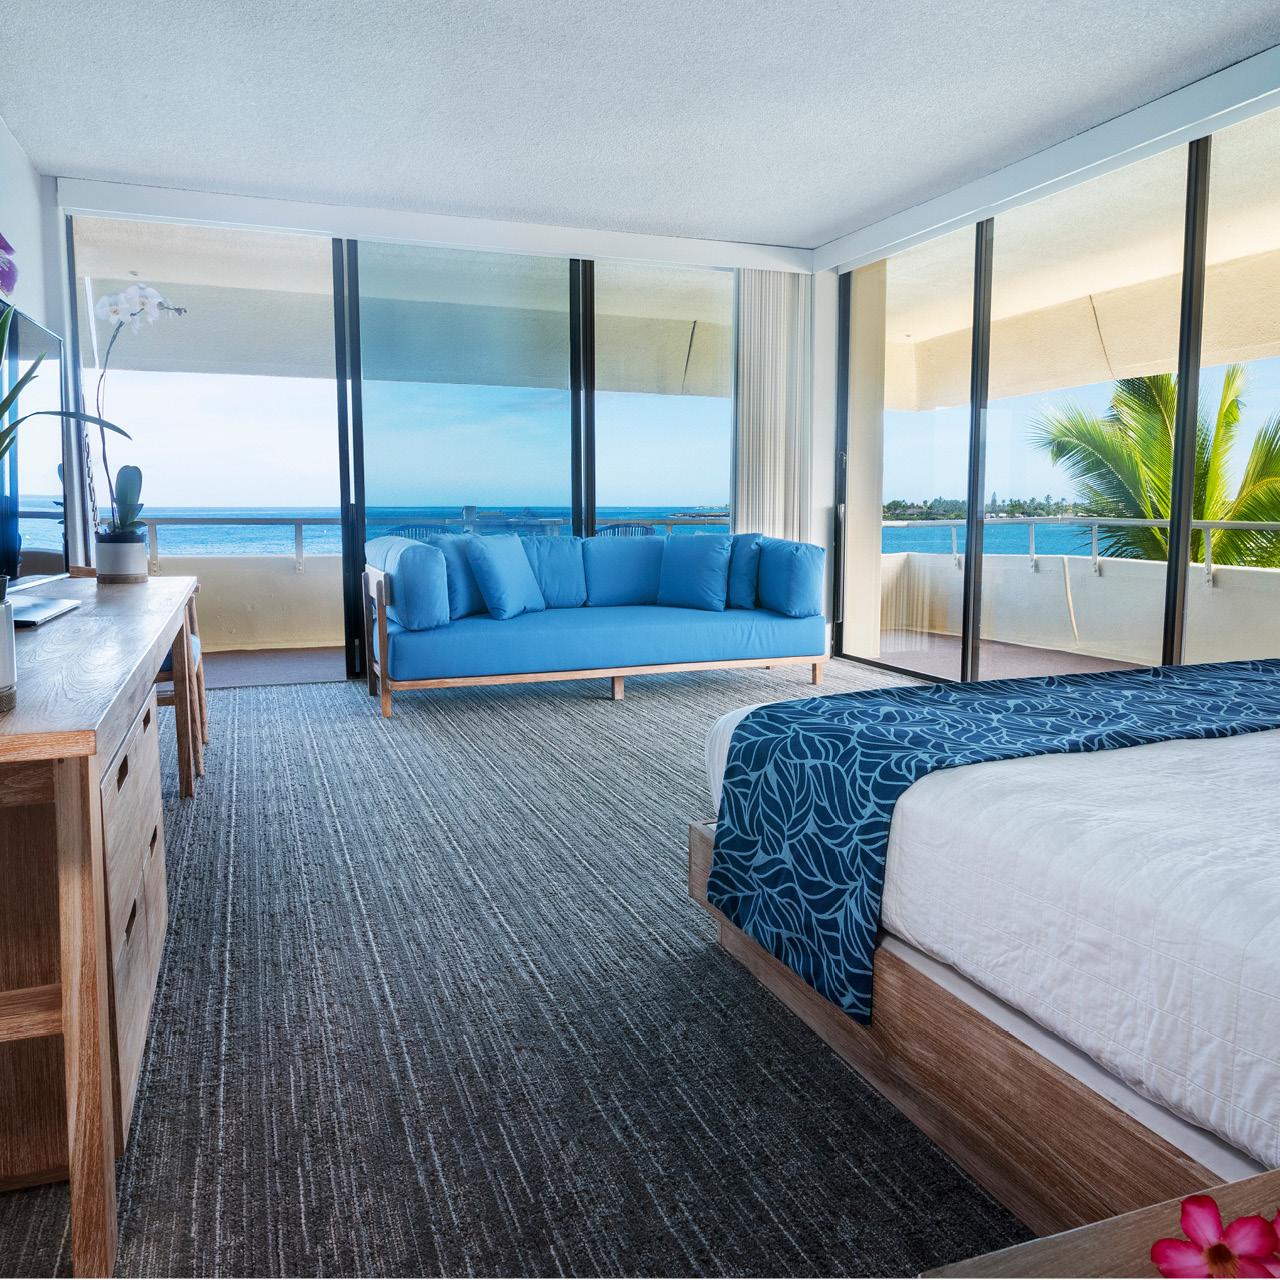 Ocean View Hotel View